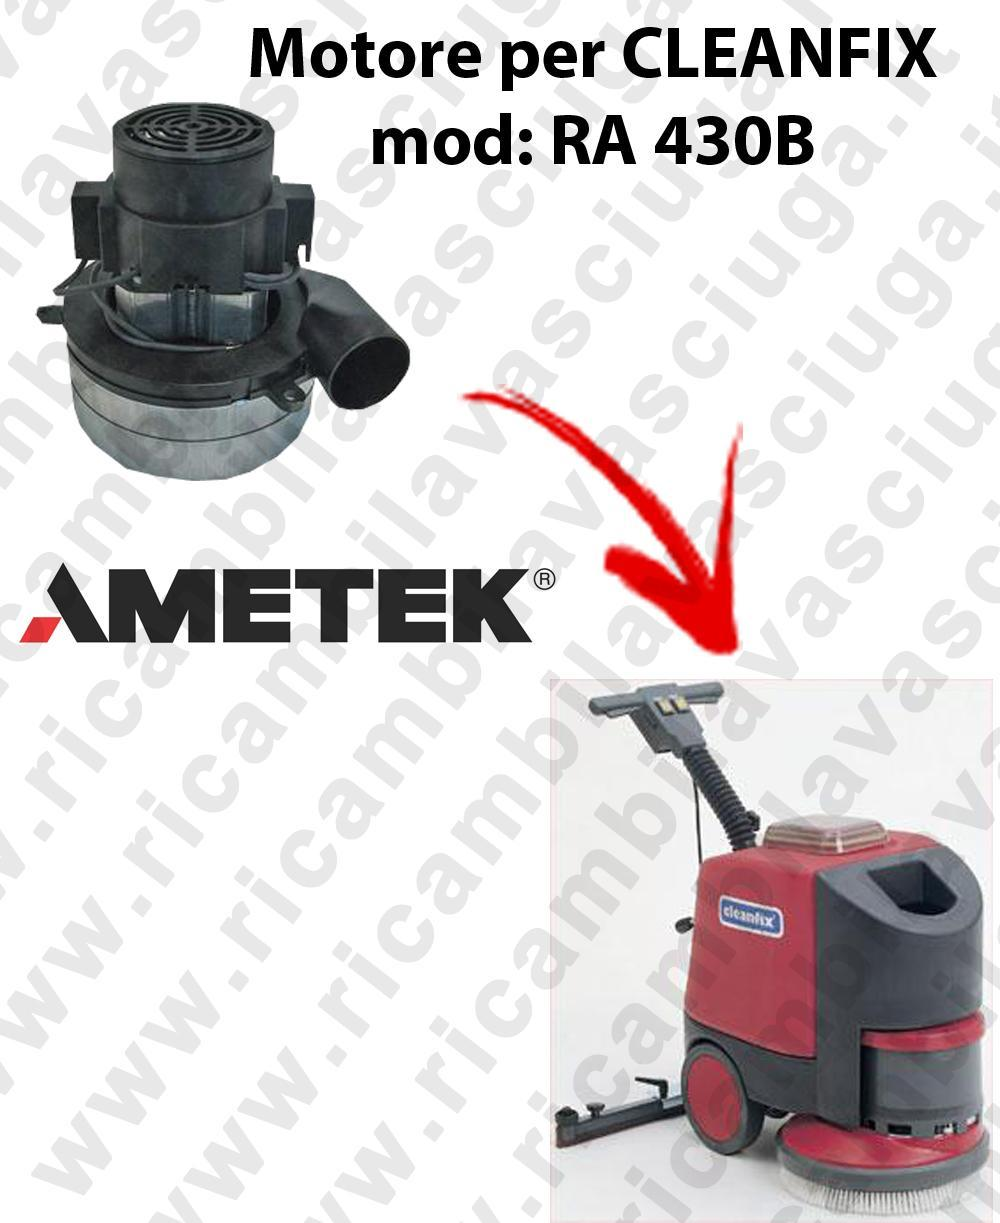 RA 430B Saugmotor AMETEK ITALIA für scheuersaugmaschinen CLEANFIX